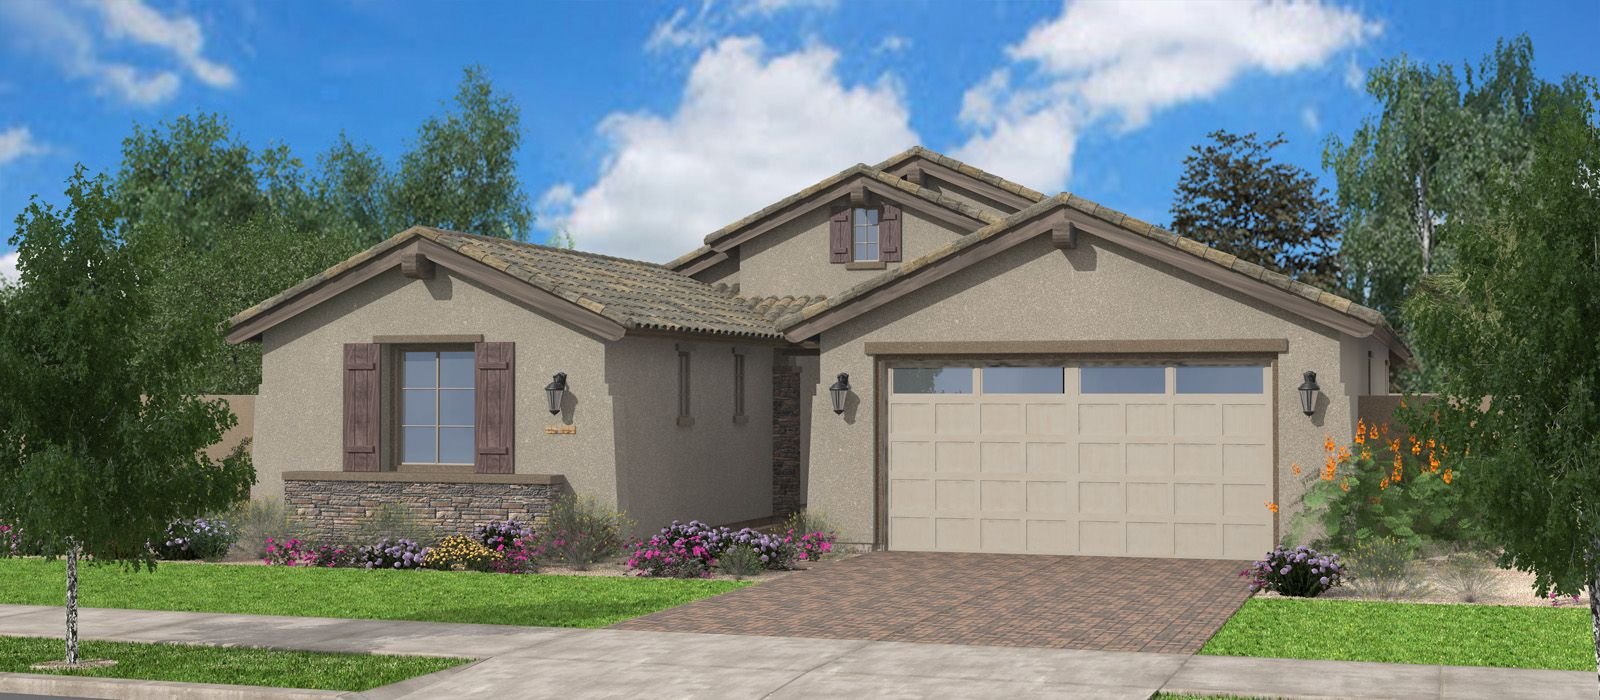 New Homes in Phoenix-Mesa, AZ | 4,262 New Homes | NewHomeSource